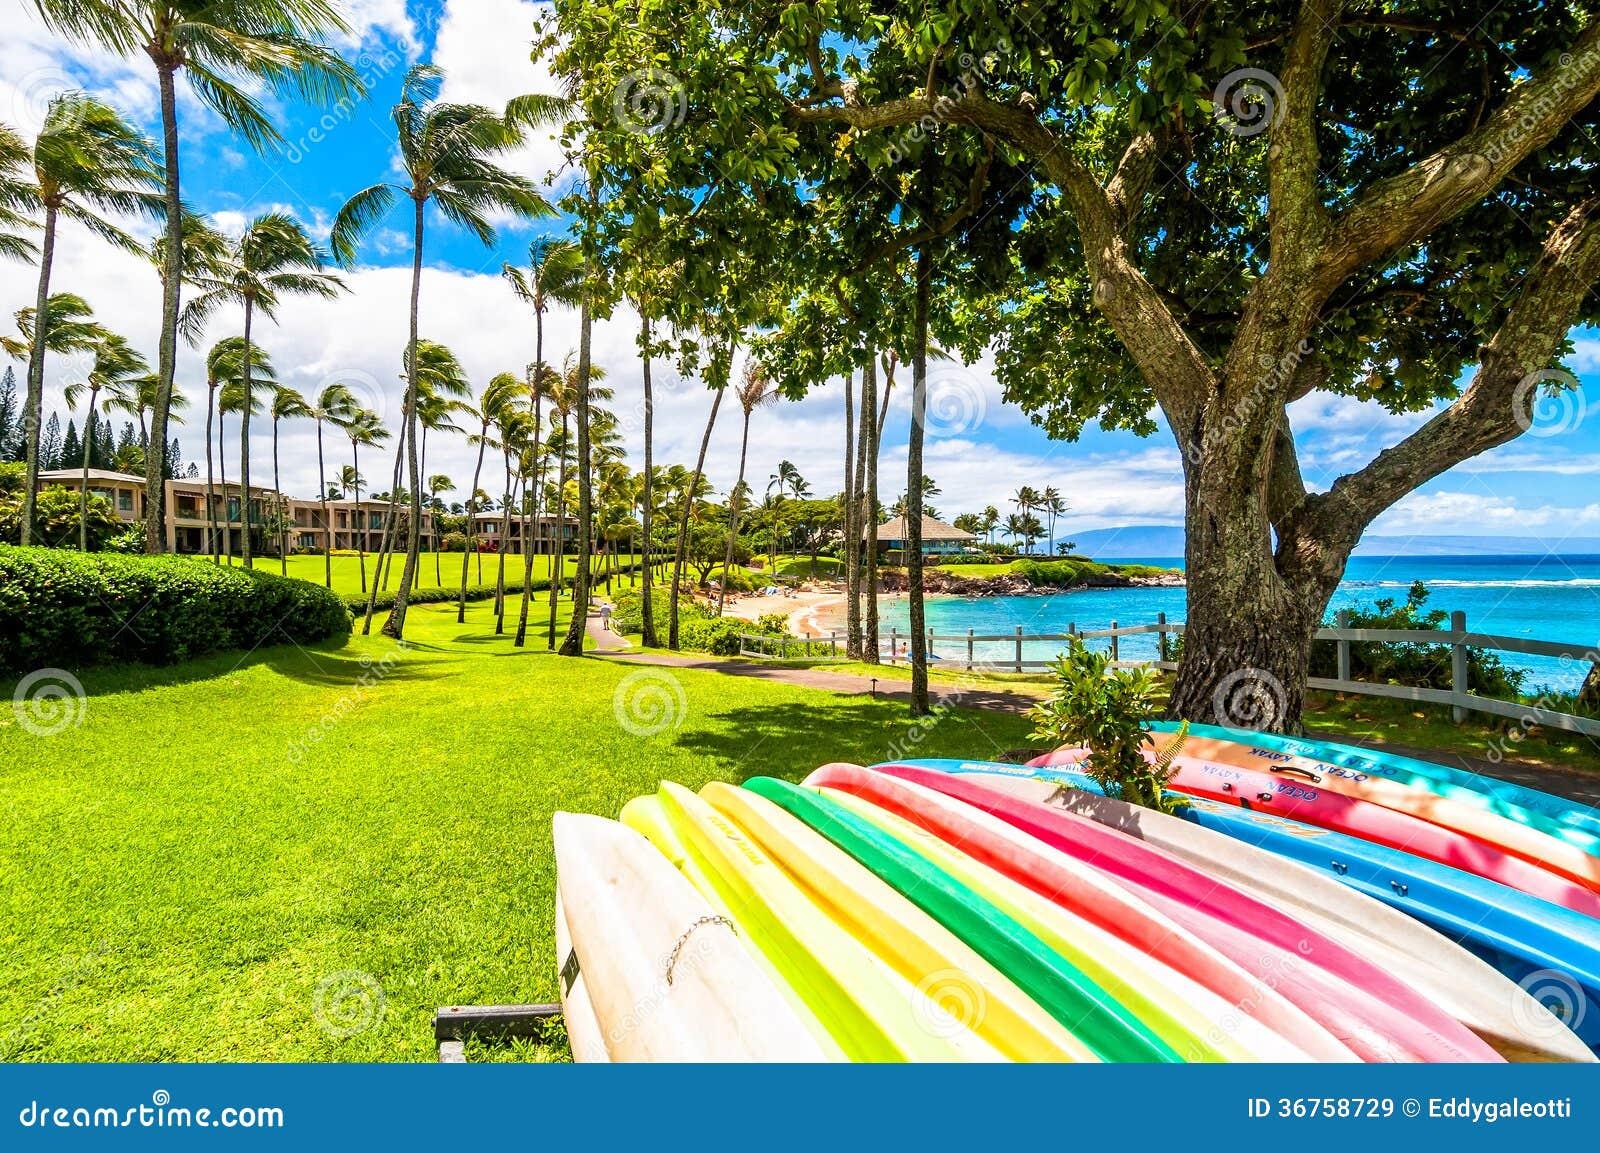 Maui S Famous Kaanapali Beach Resort Area Editorial Stock